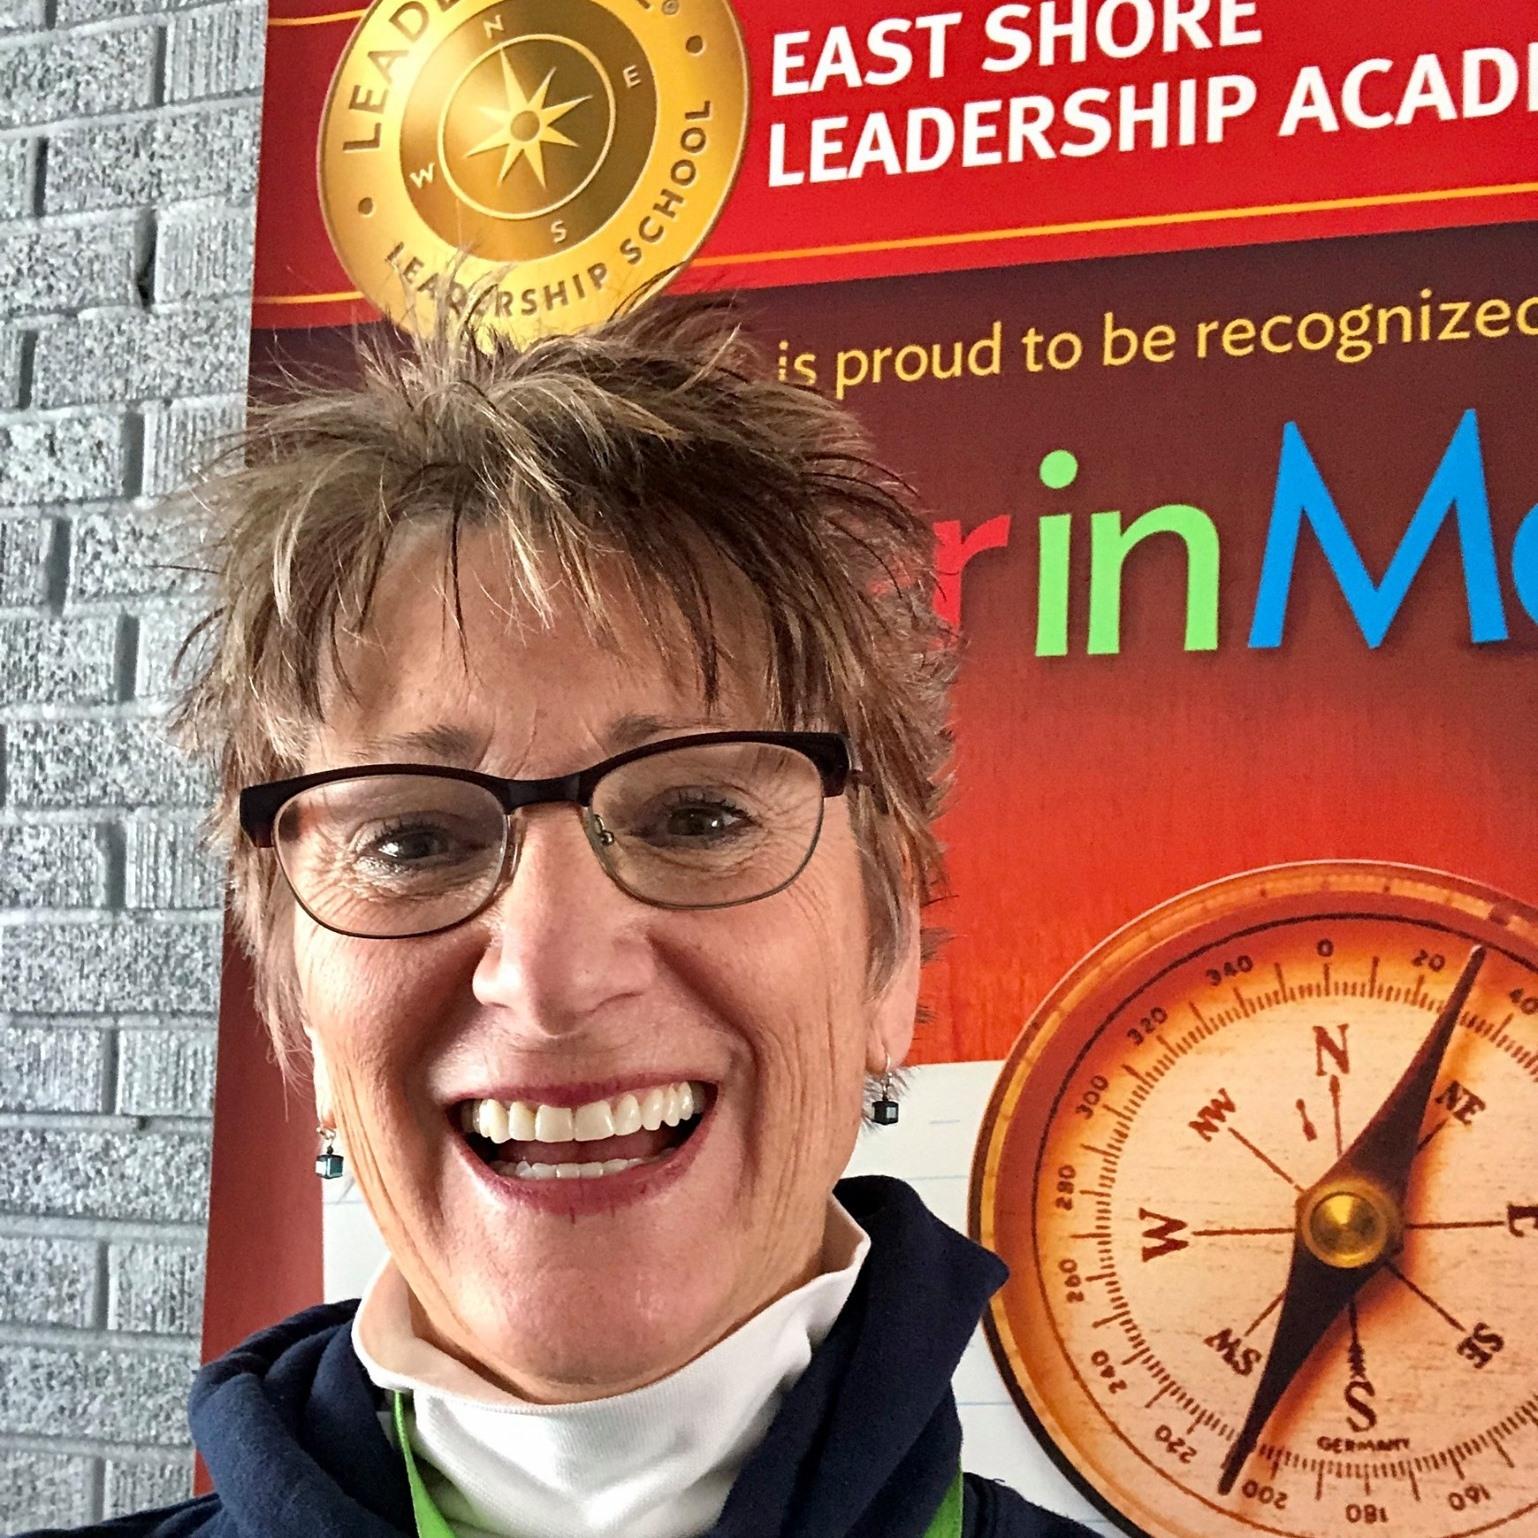 Nancy Gardner - East Shore Leadership Academy